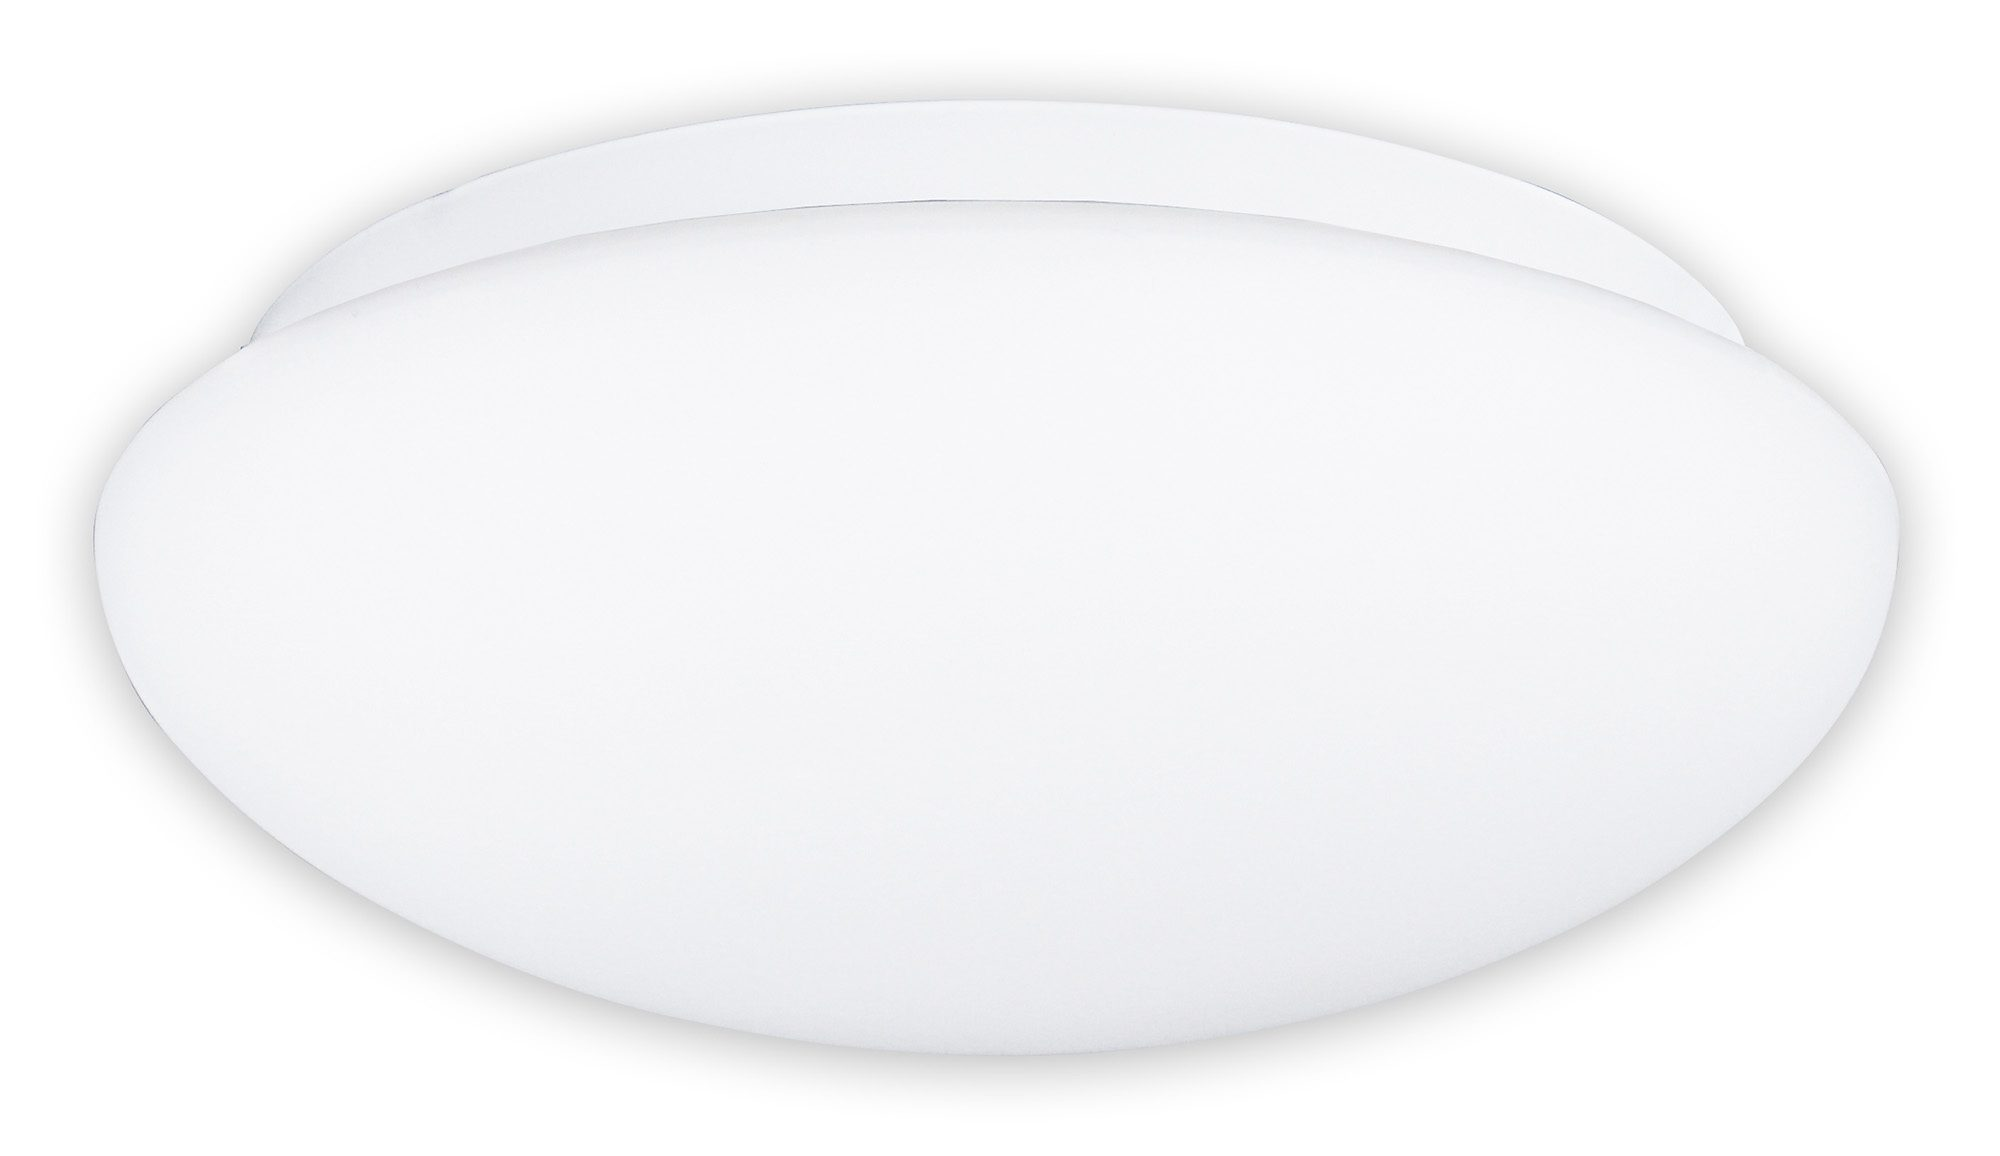 Näve LED-Deckenleuchte mit Sensor